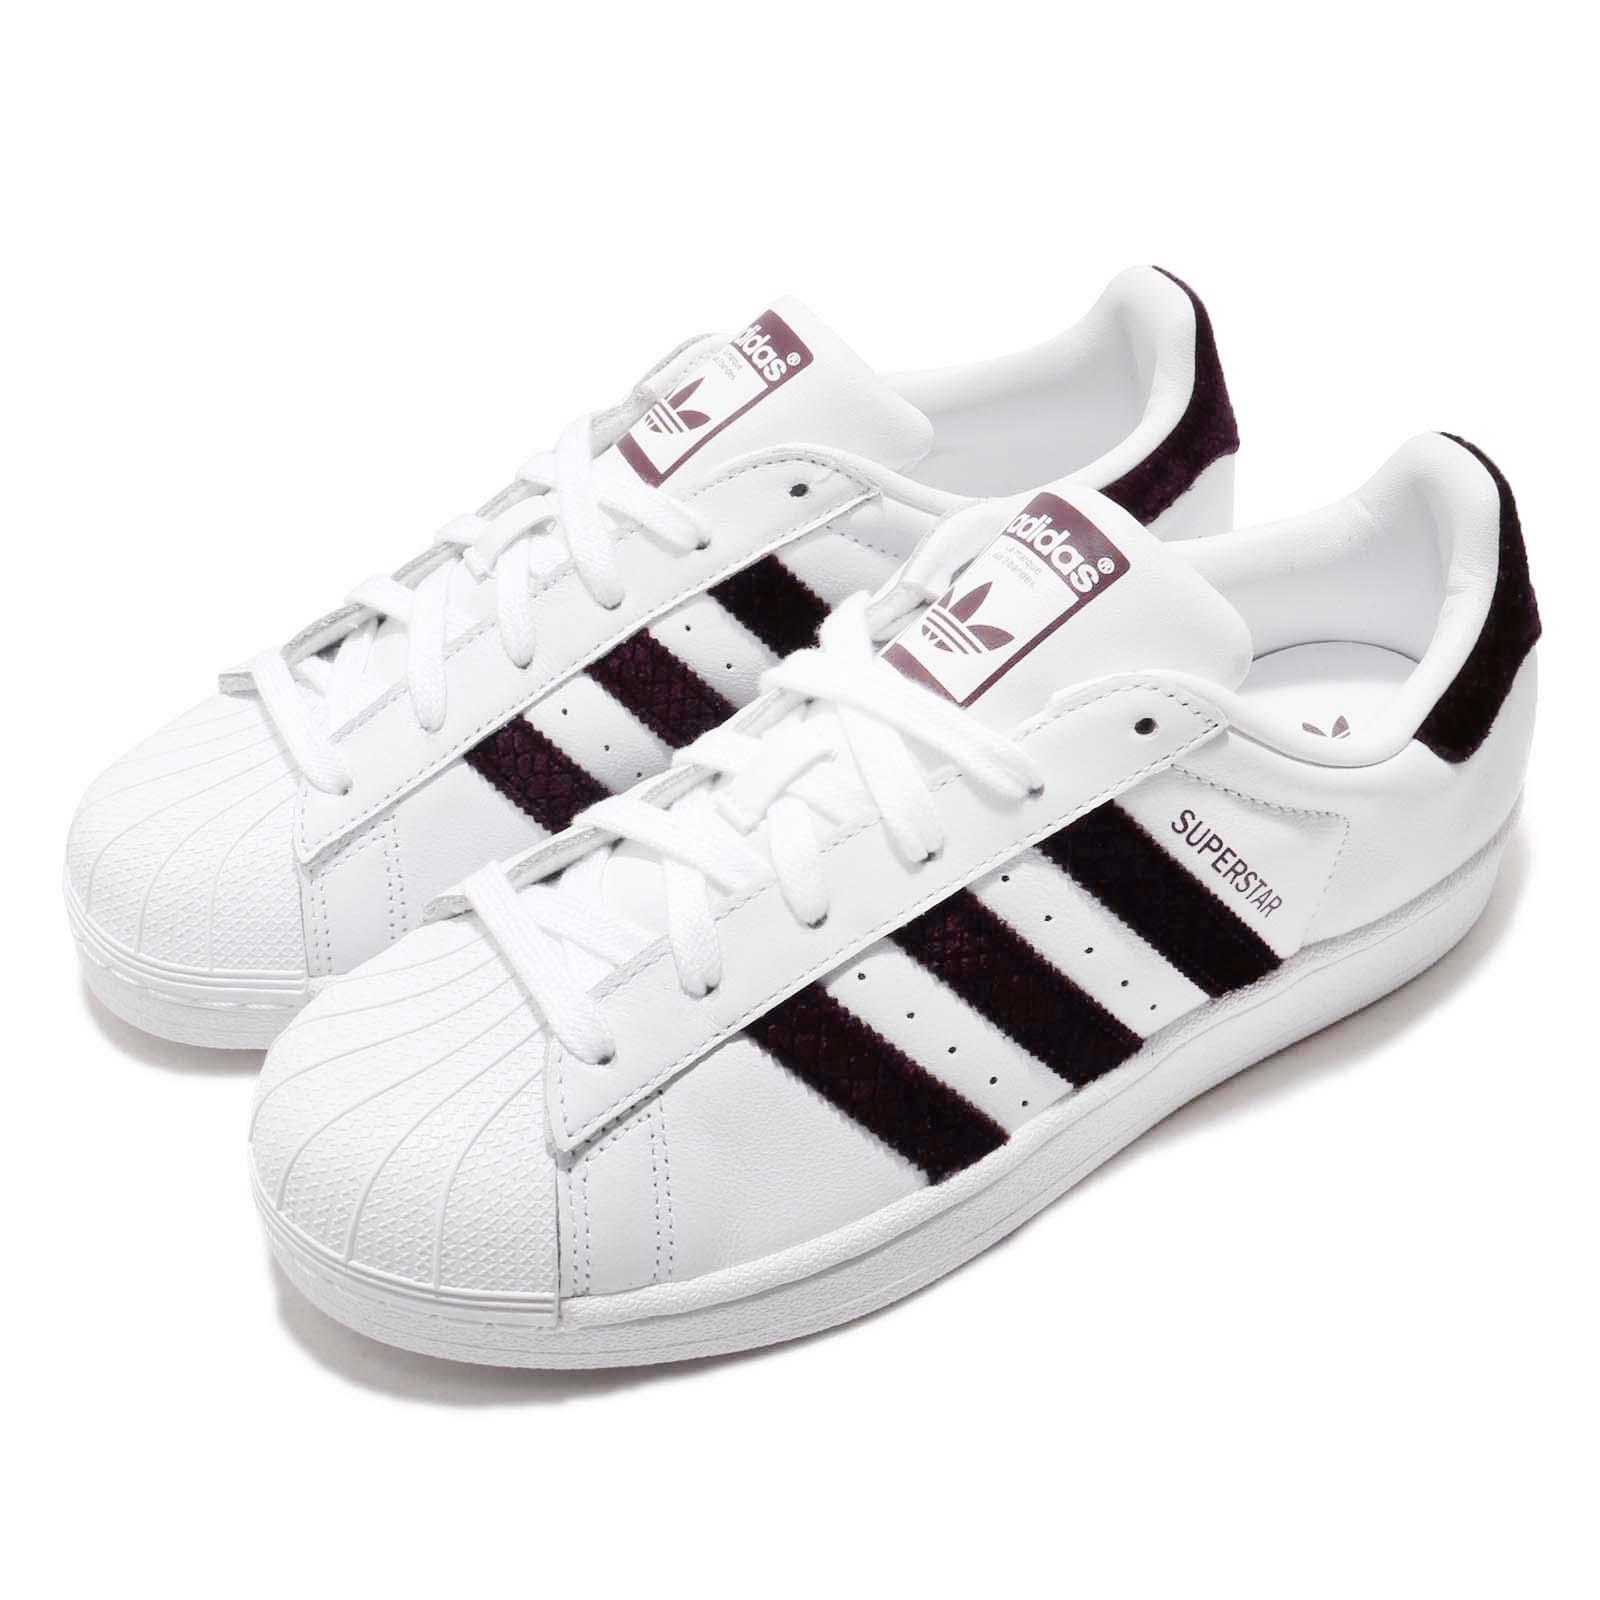 adidas 休閒鞋 Superstar 低筒 運動 女鞋 G26000